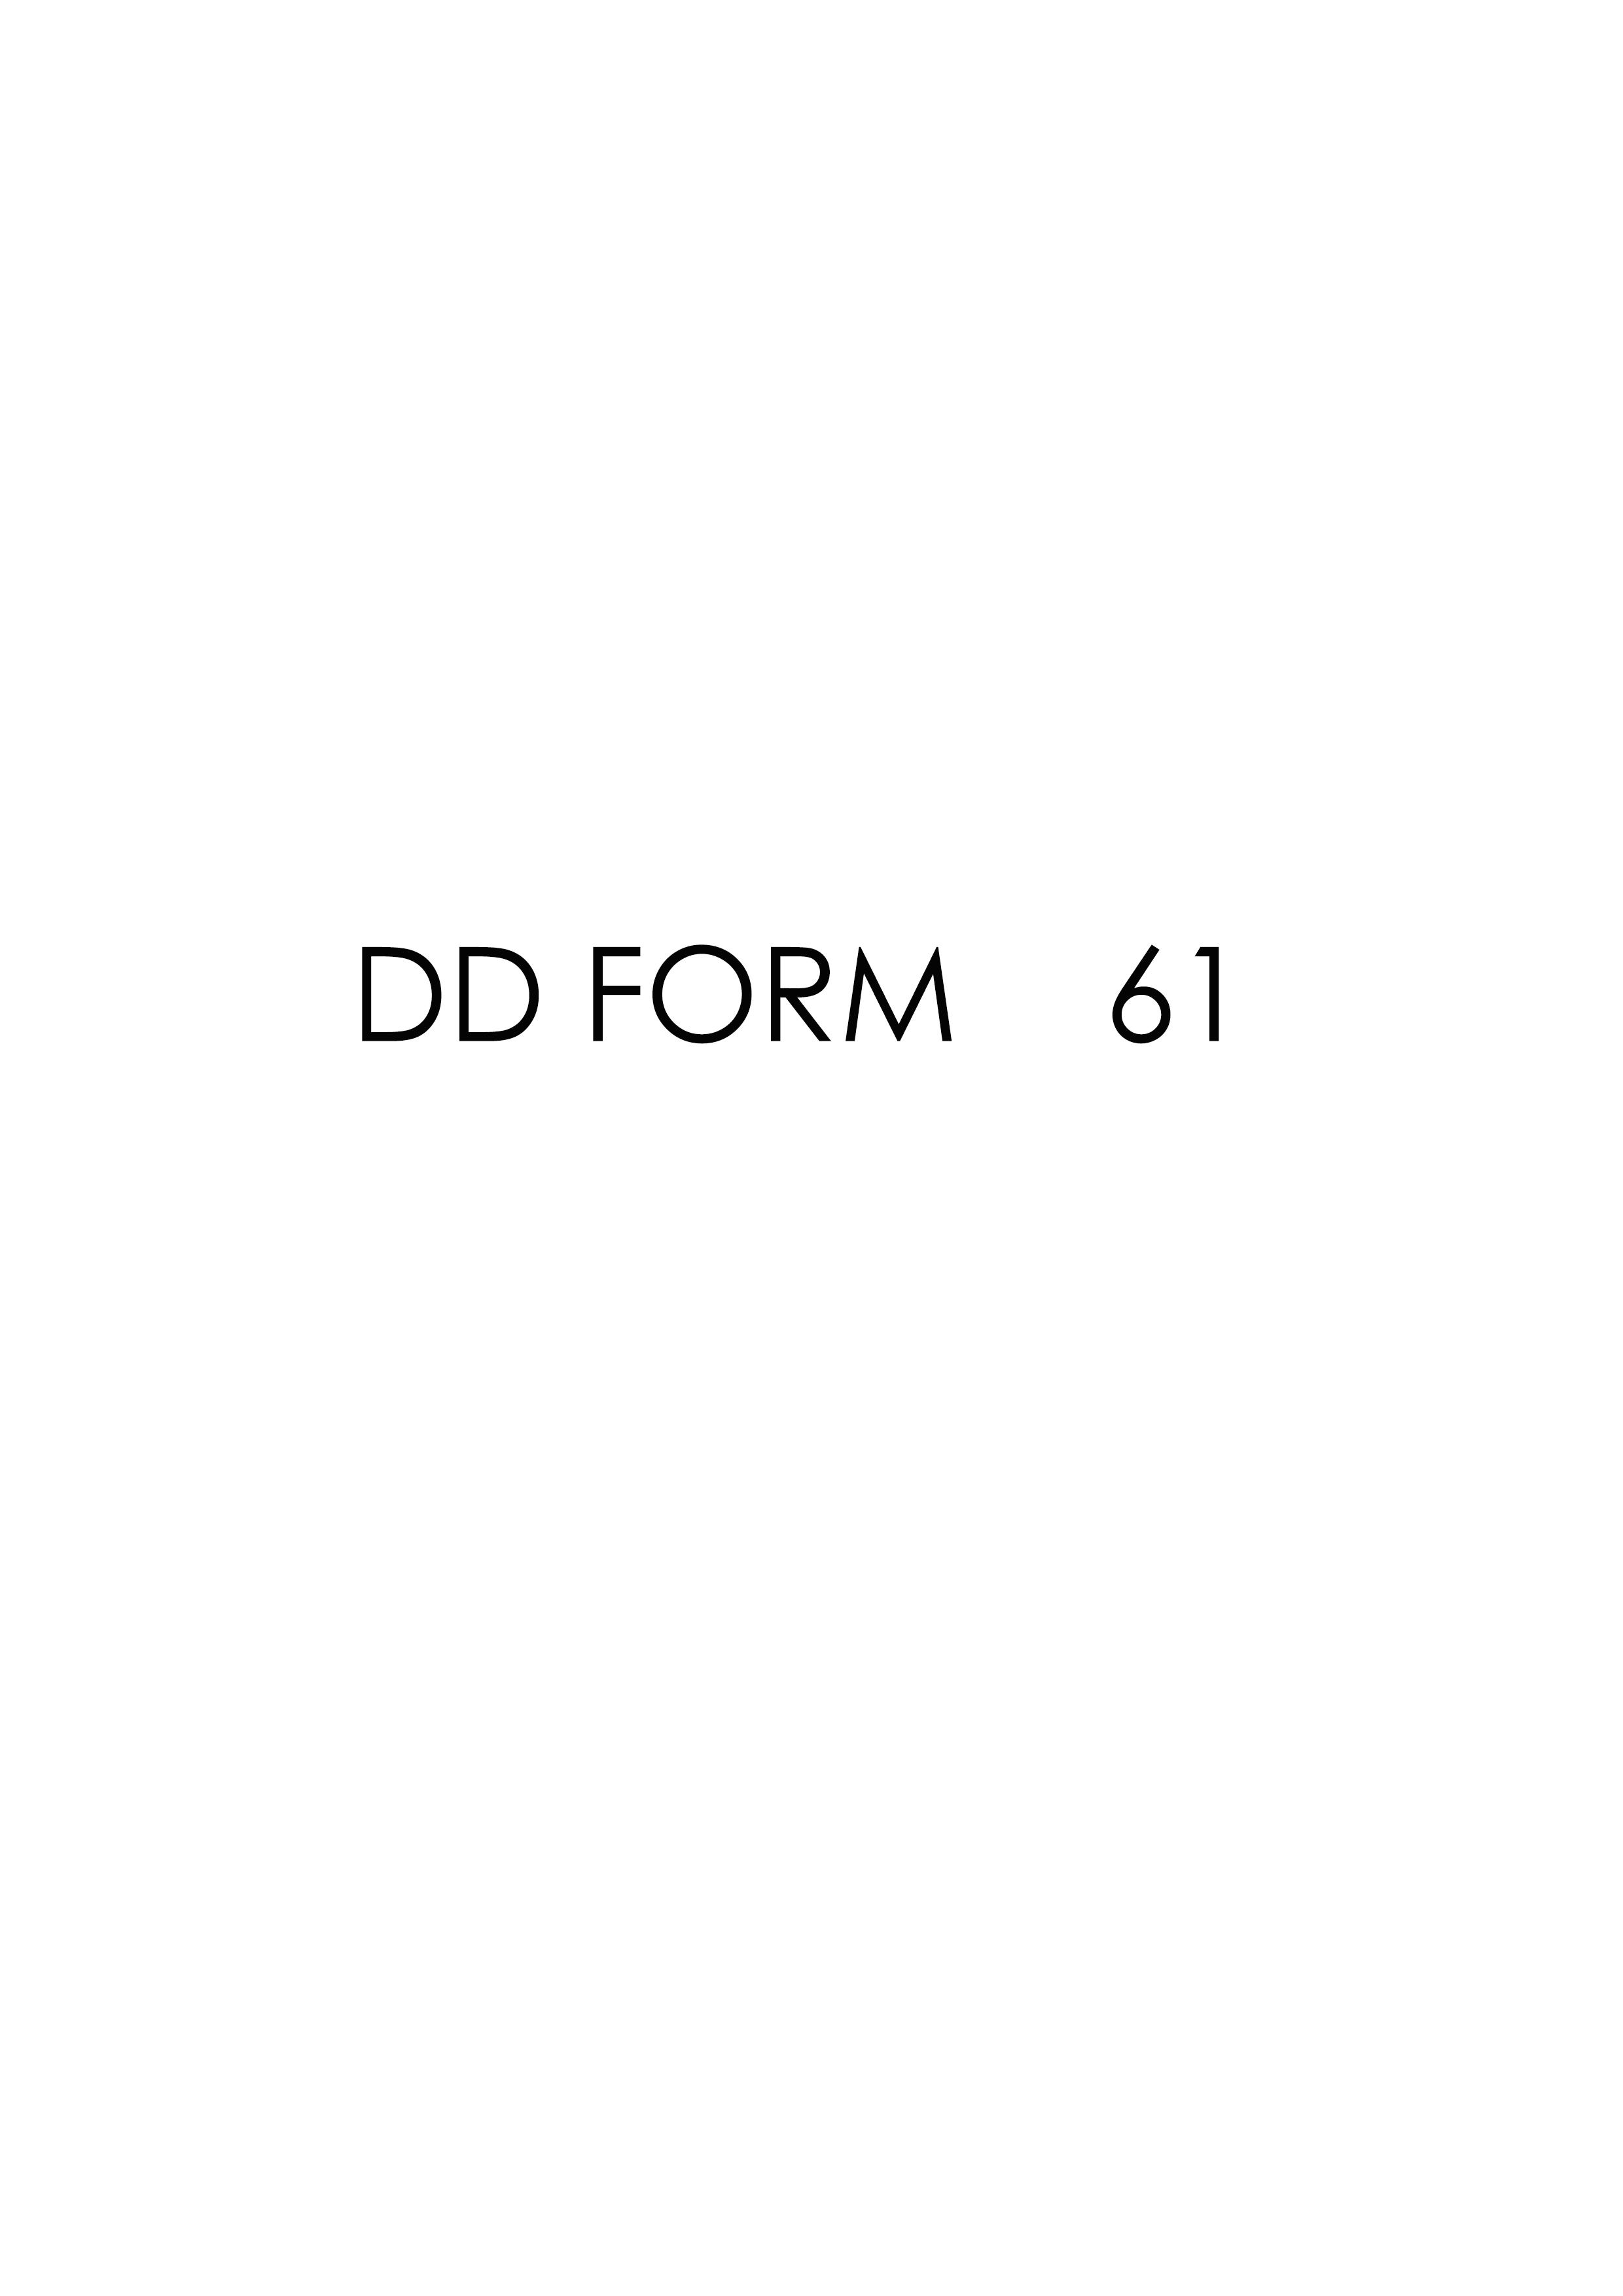 Download dd Form 61 Free